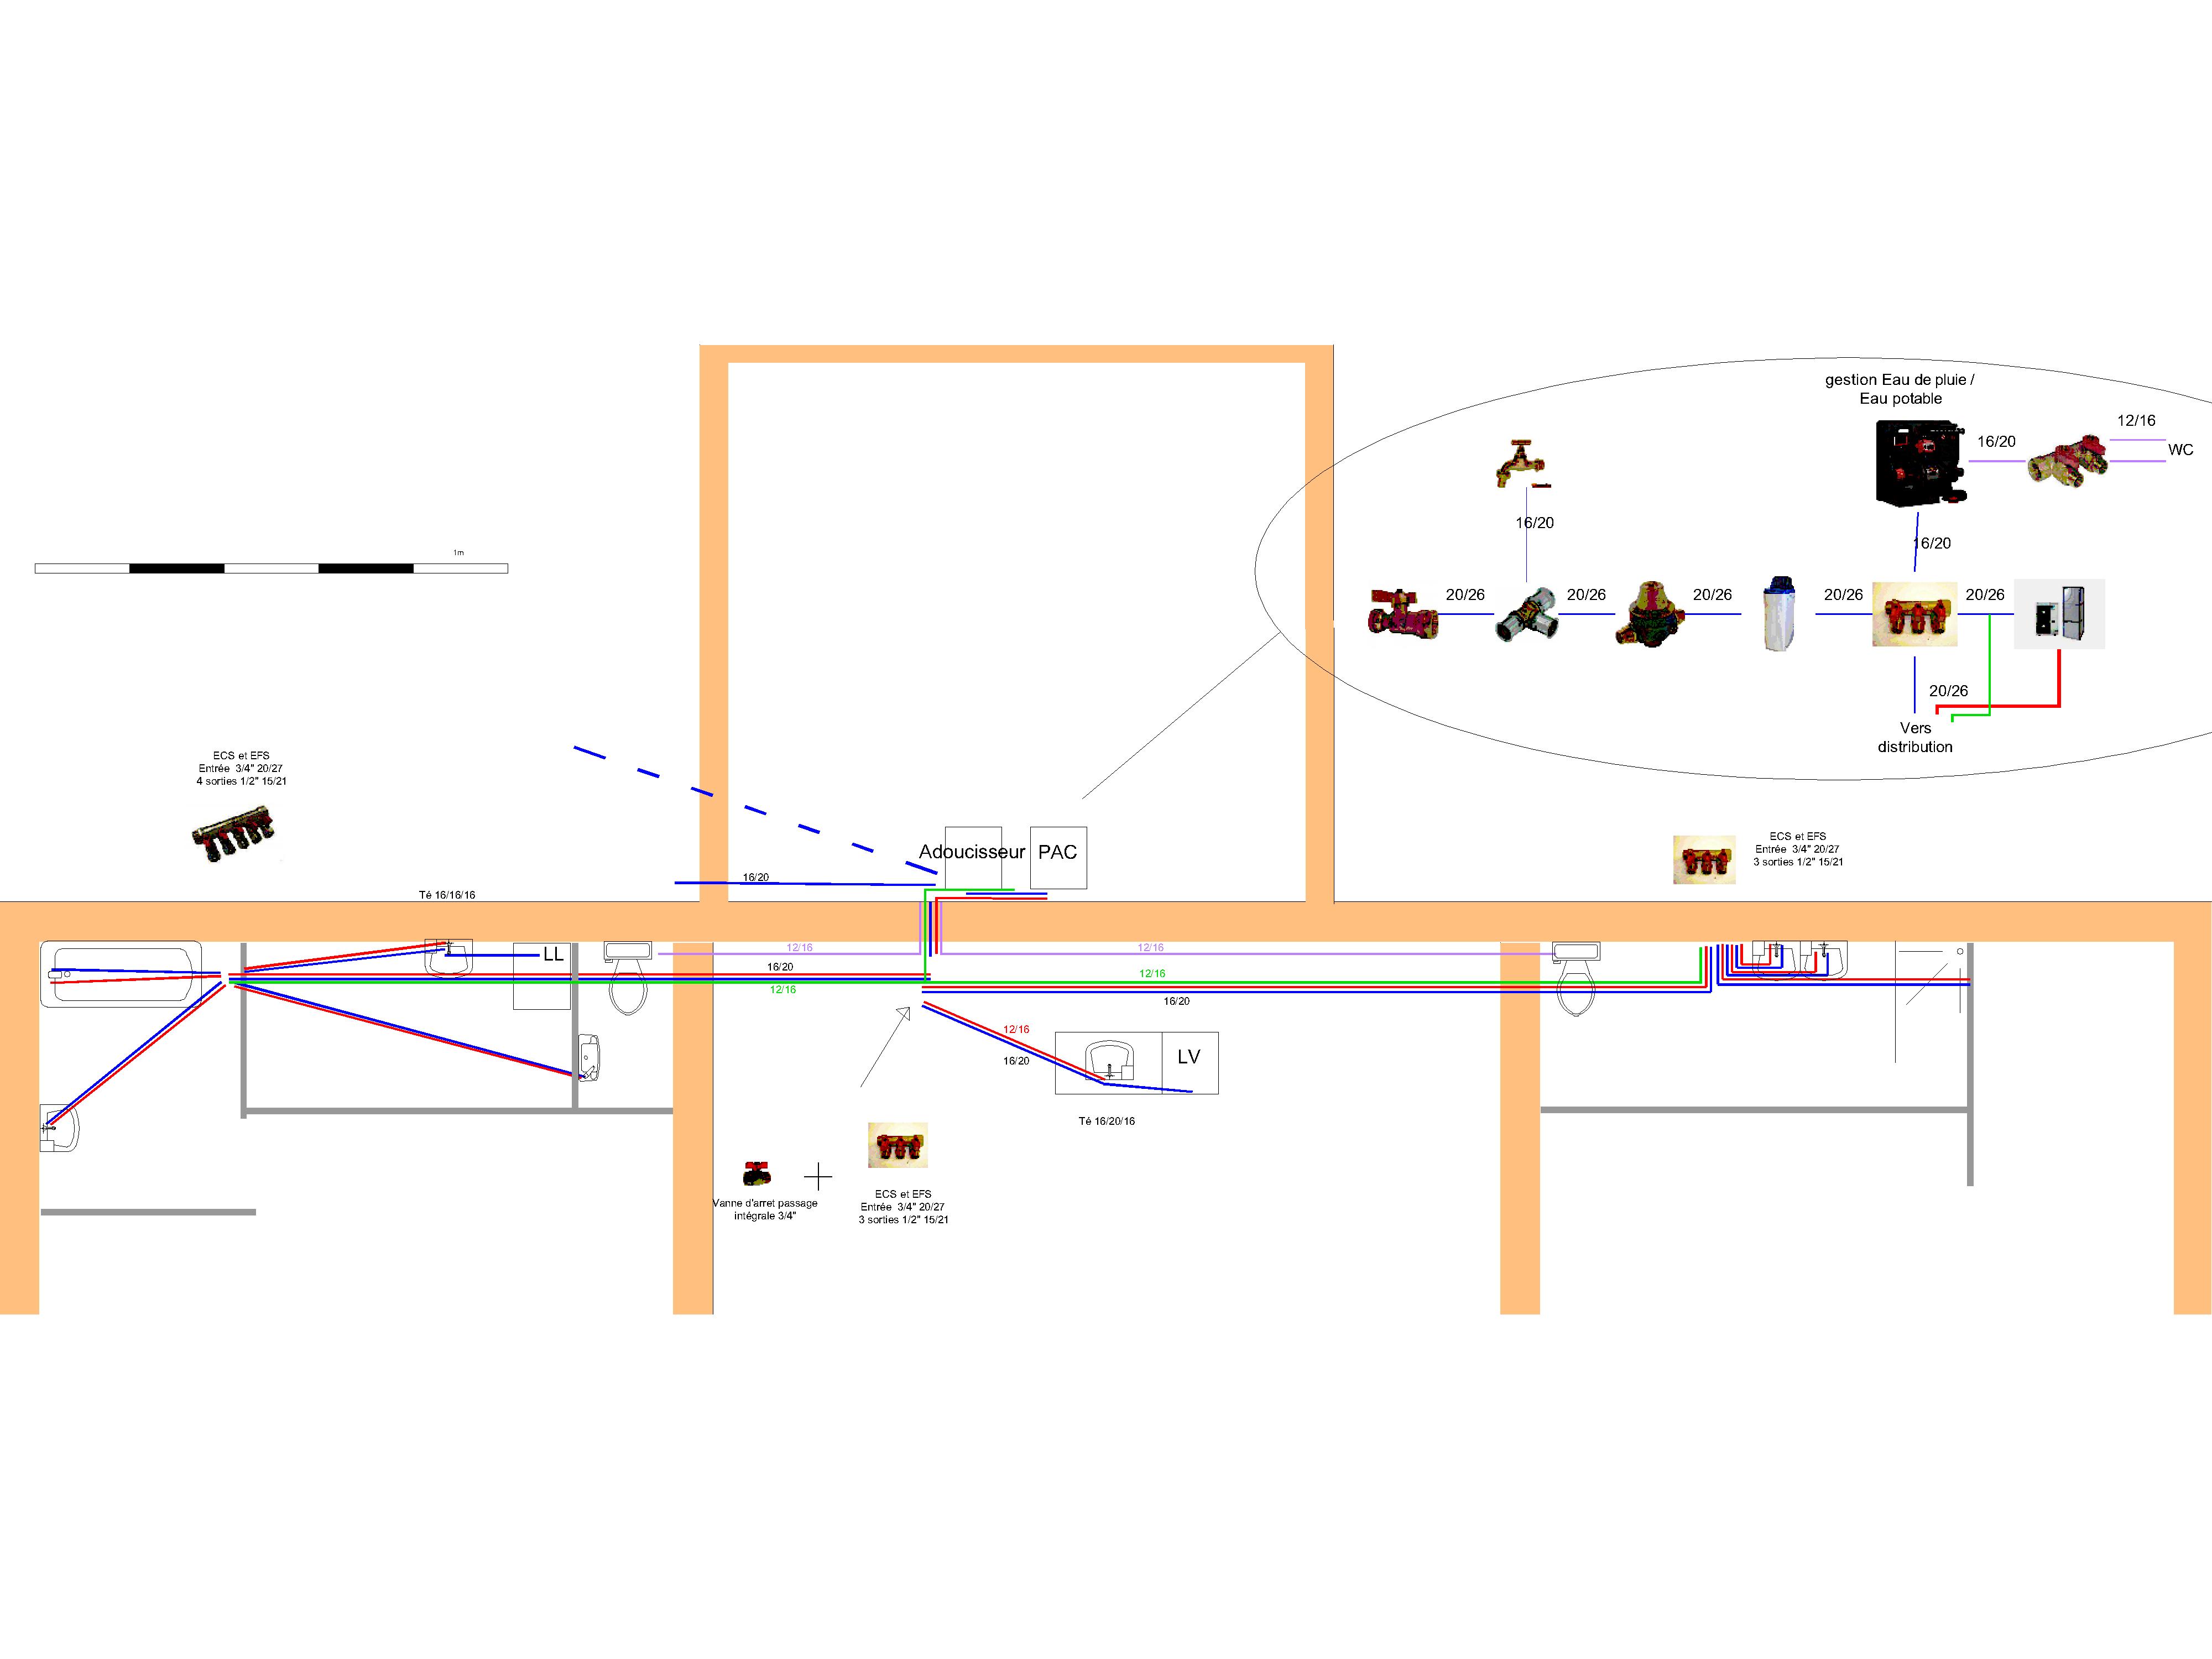 Plan reseau eau-Model.png, 122.03 kb, 4000 x 3000